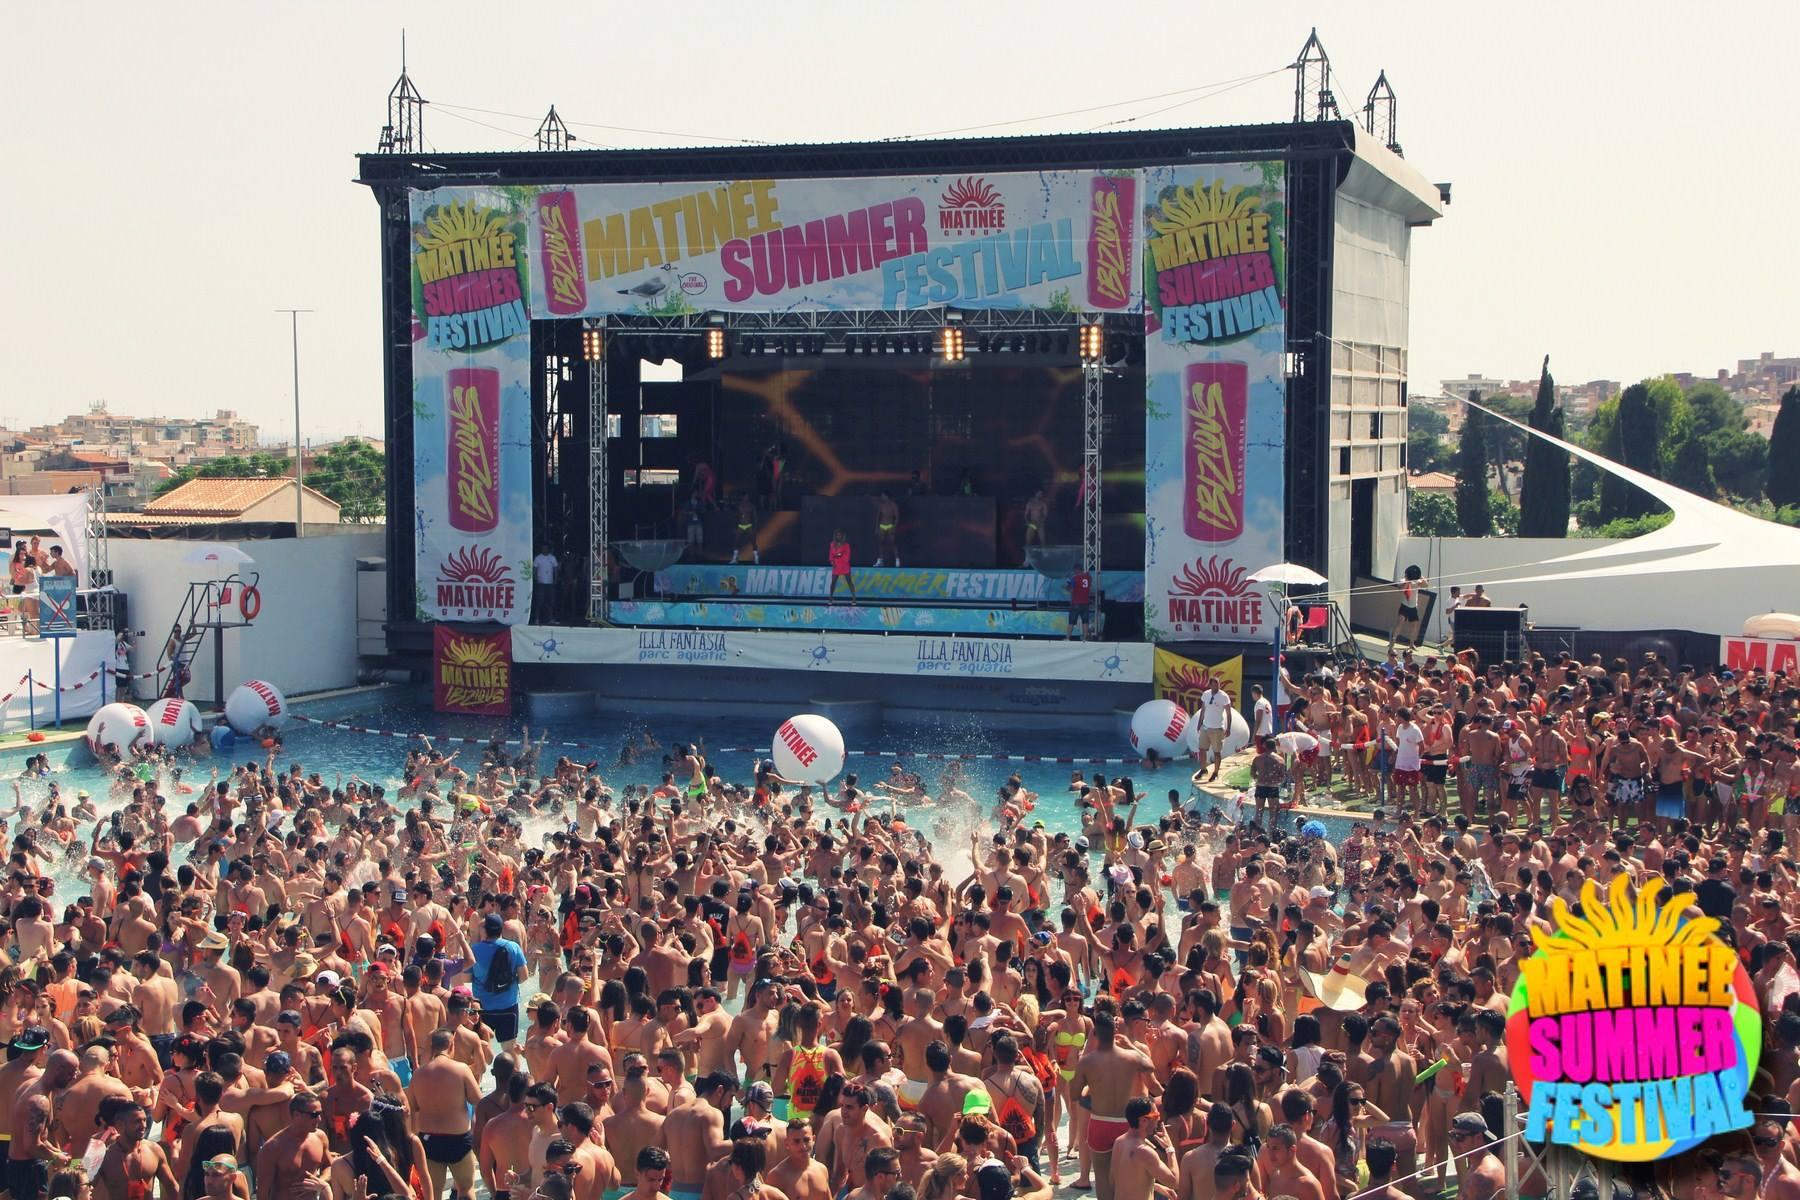 matinee summer festival madridedm